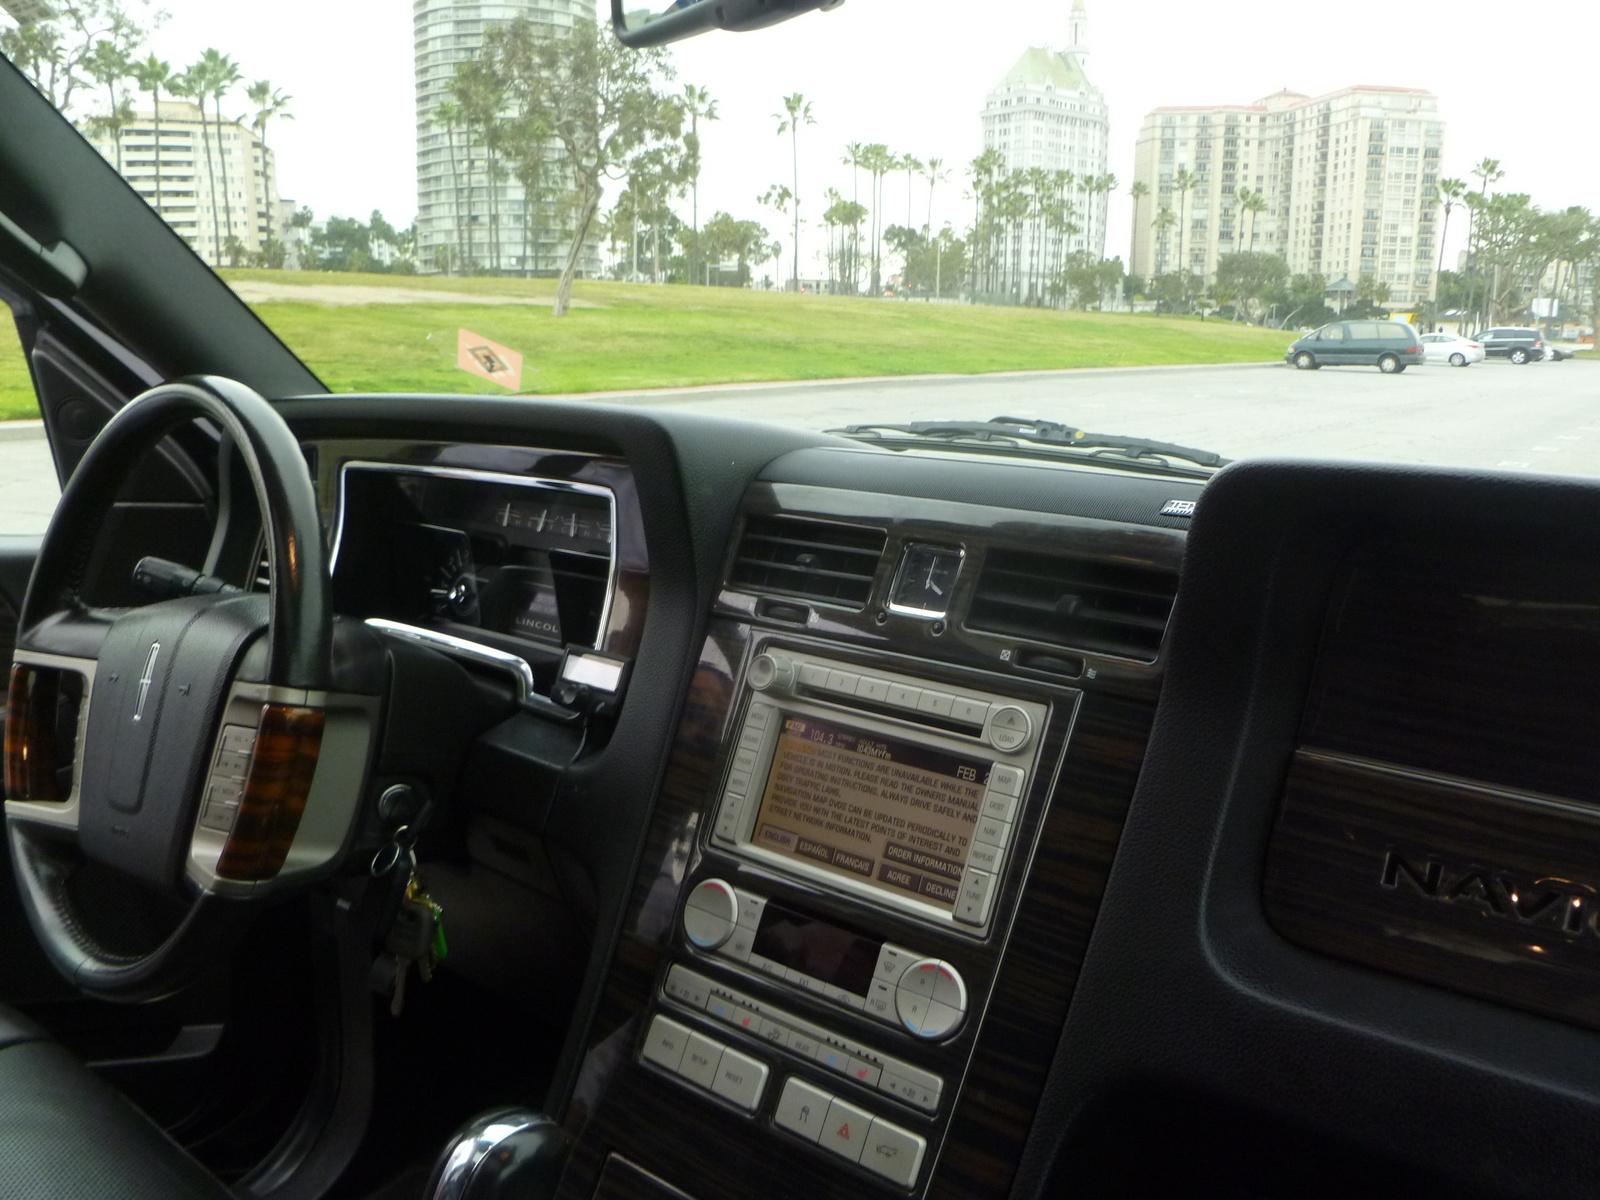 2008 Lincoln Navigator Pictures Cargurus